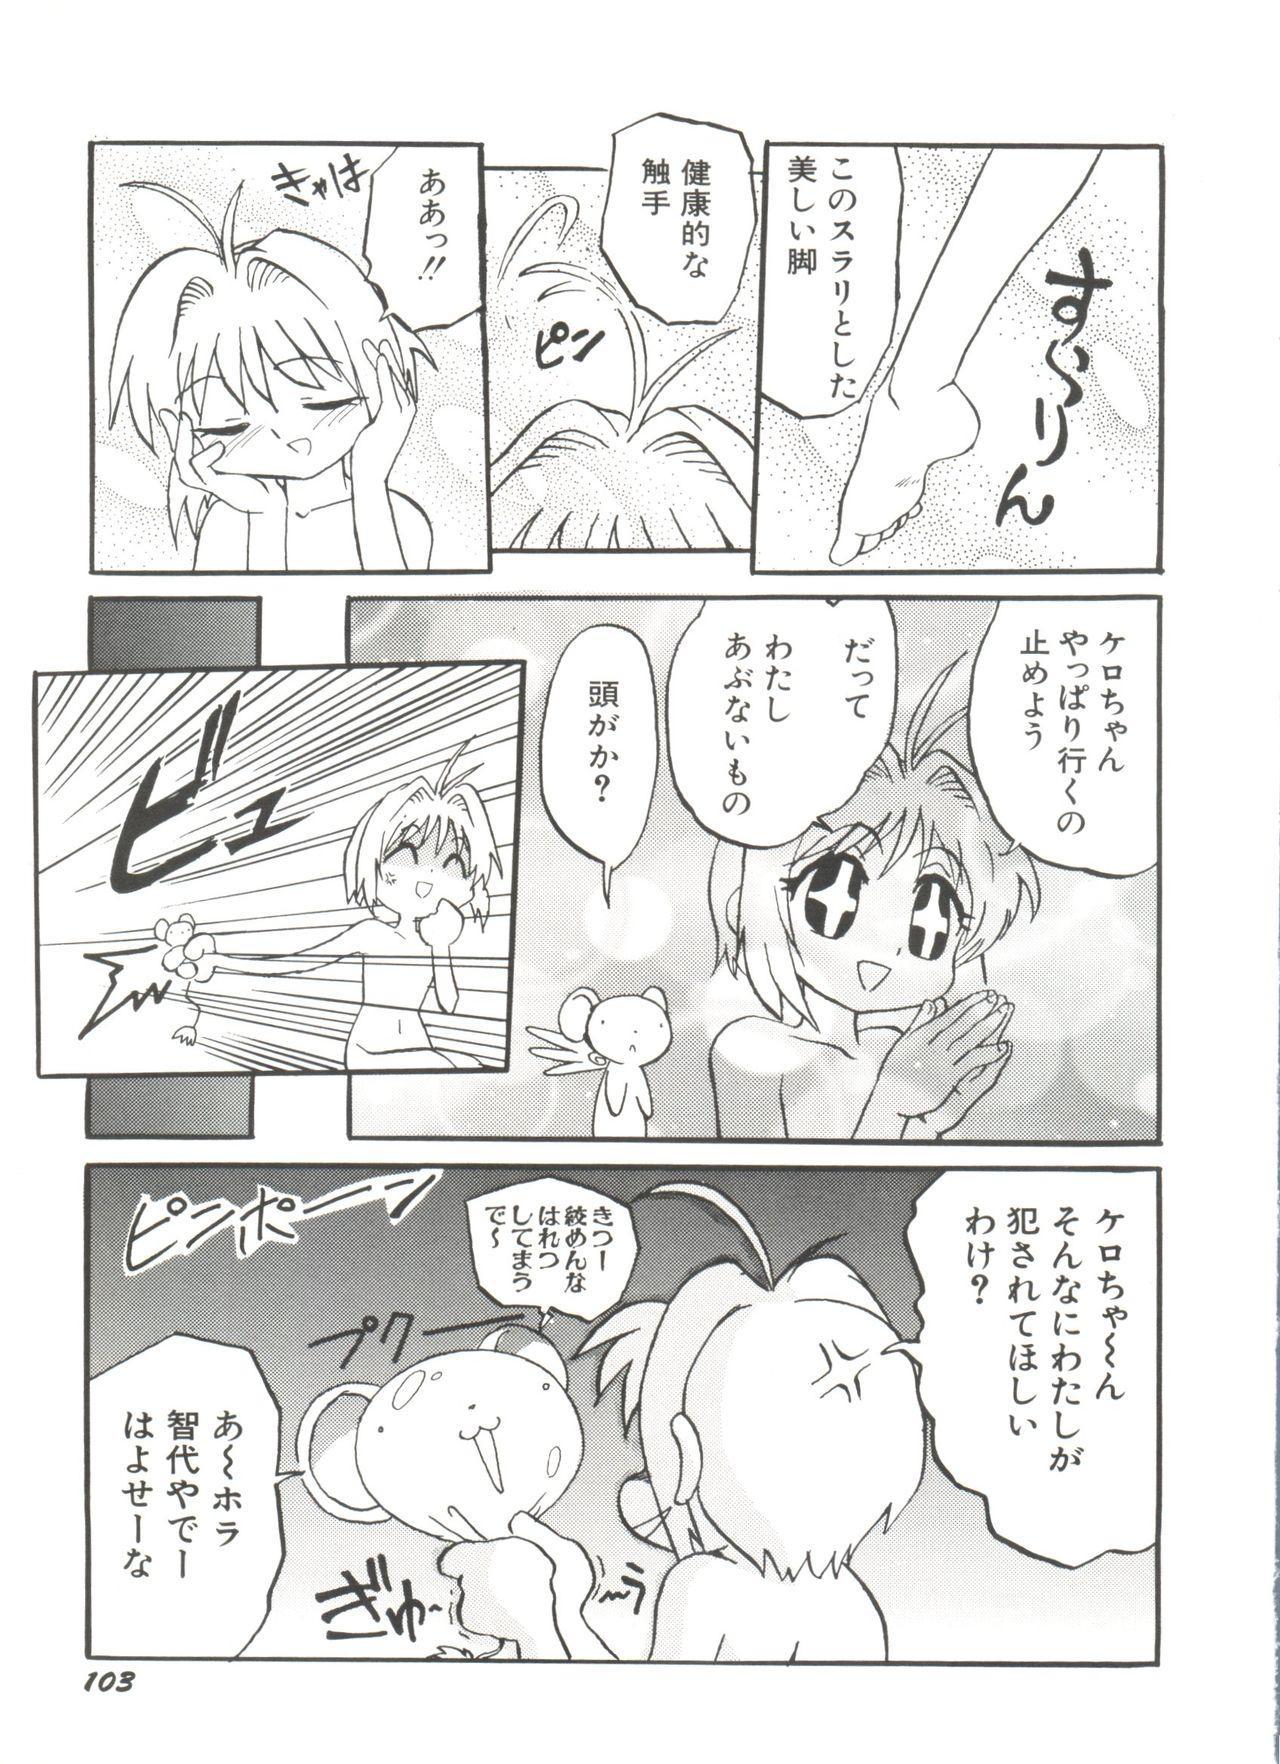 [Anthology] Denei Tamatebako 8 - Utakata no Tenshi-tachi II (Various) 104